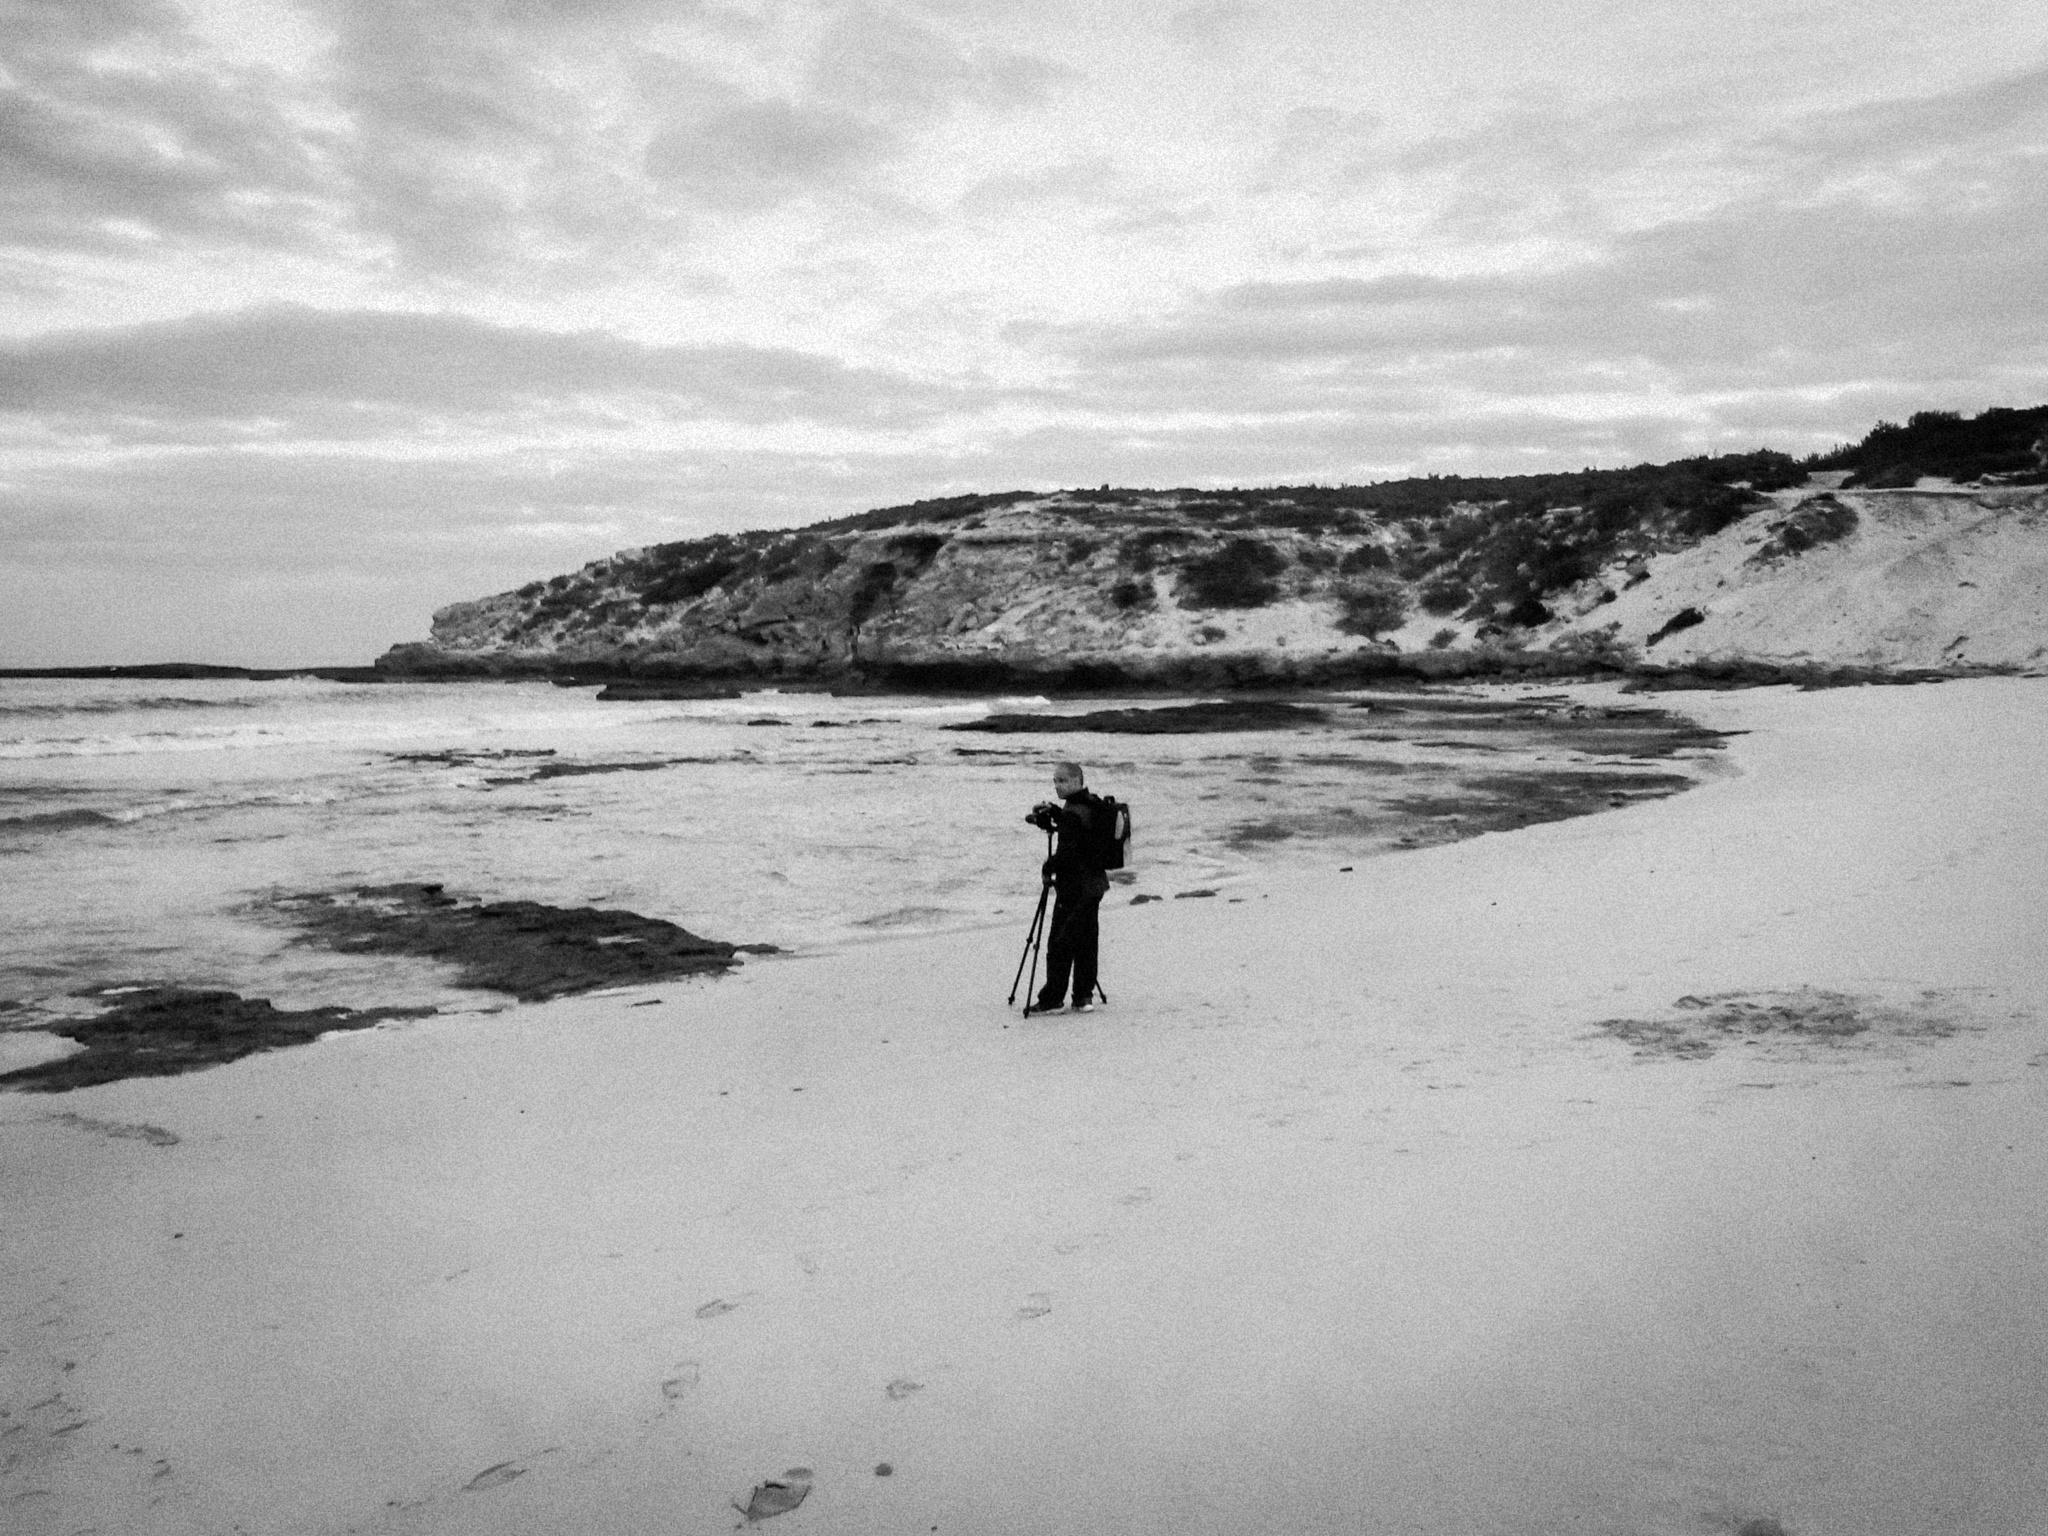 Me at the Beach by Ryan Veldsman